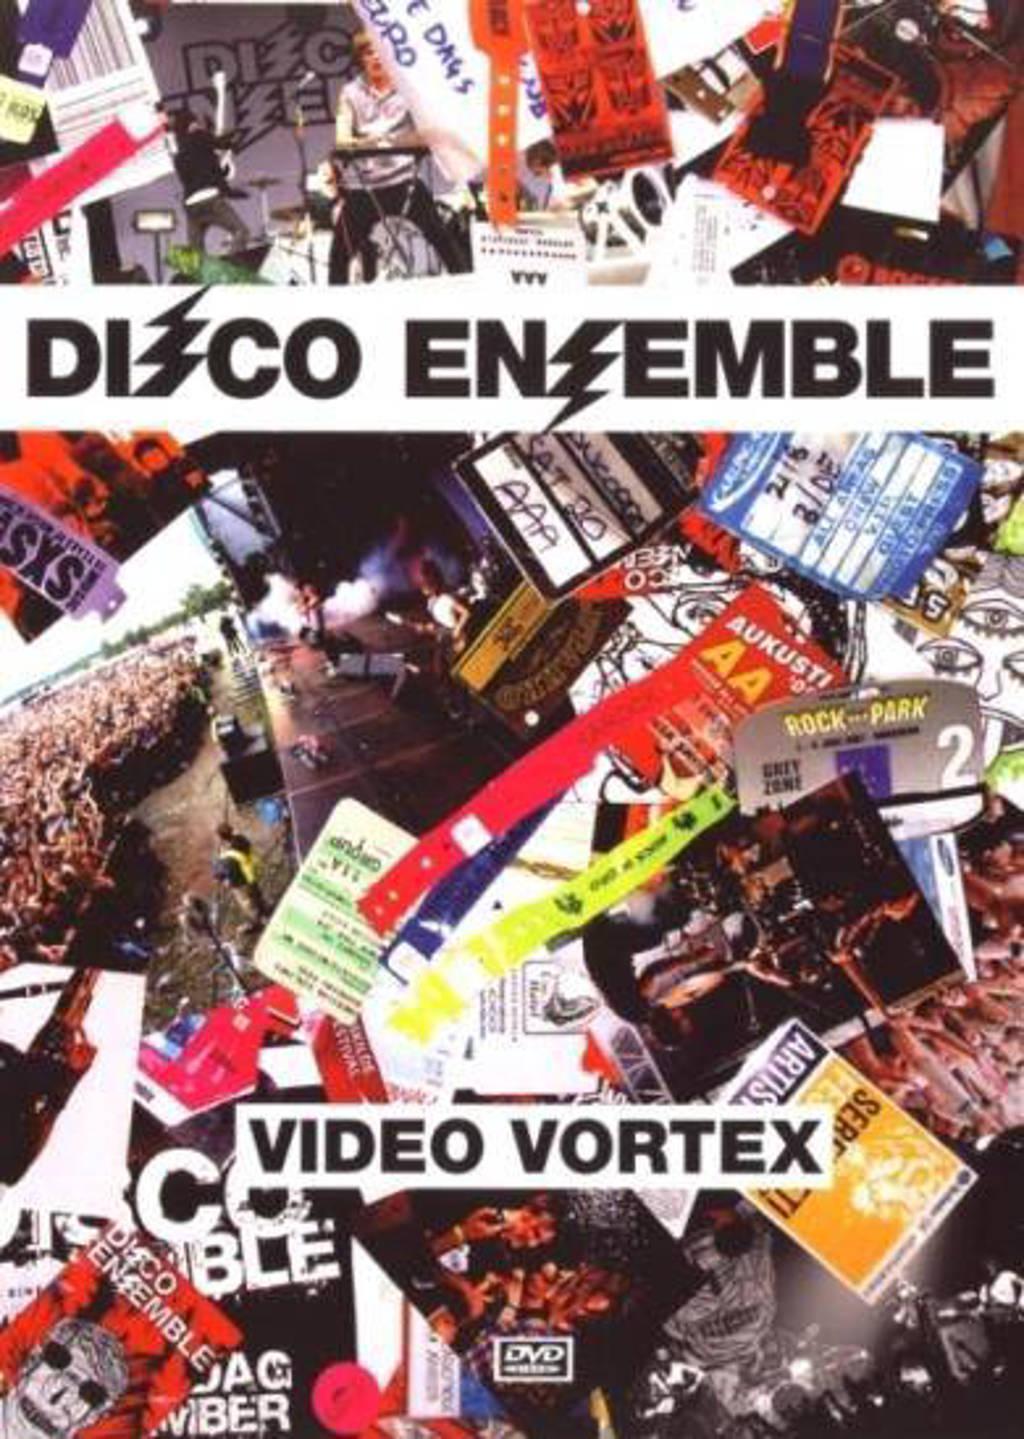 Disco Ensemble - Video Vortex (DVD)